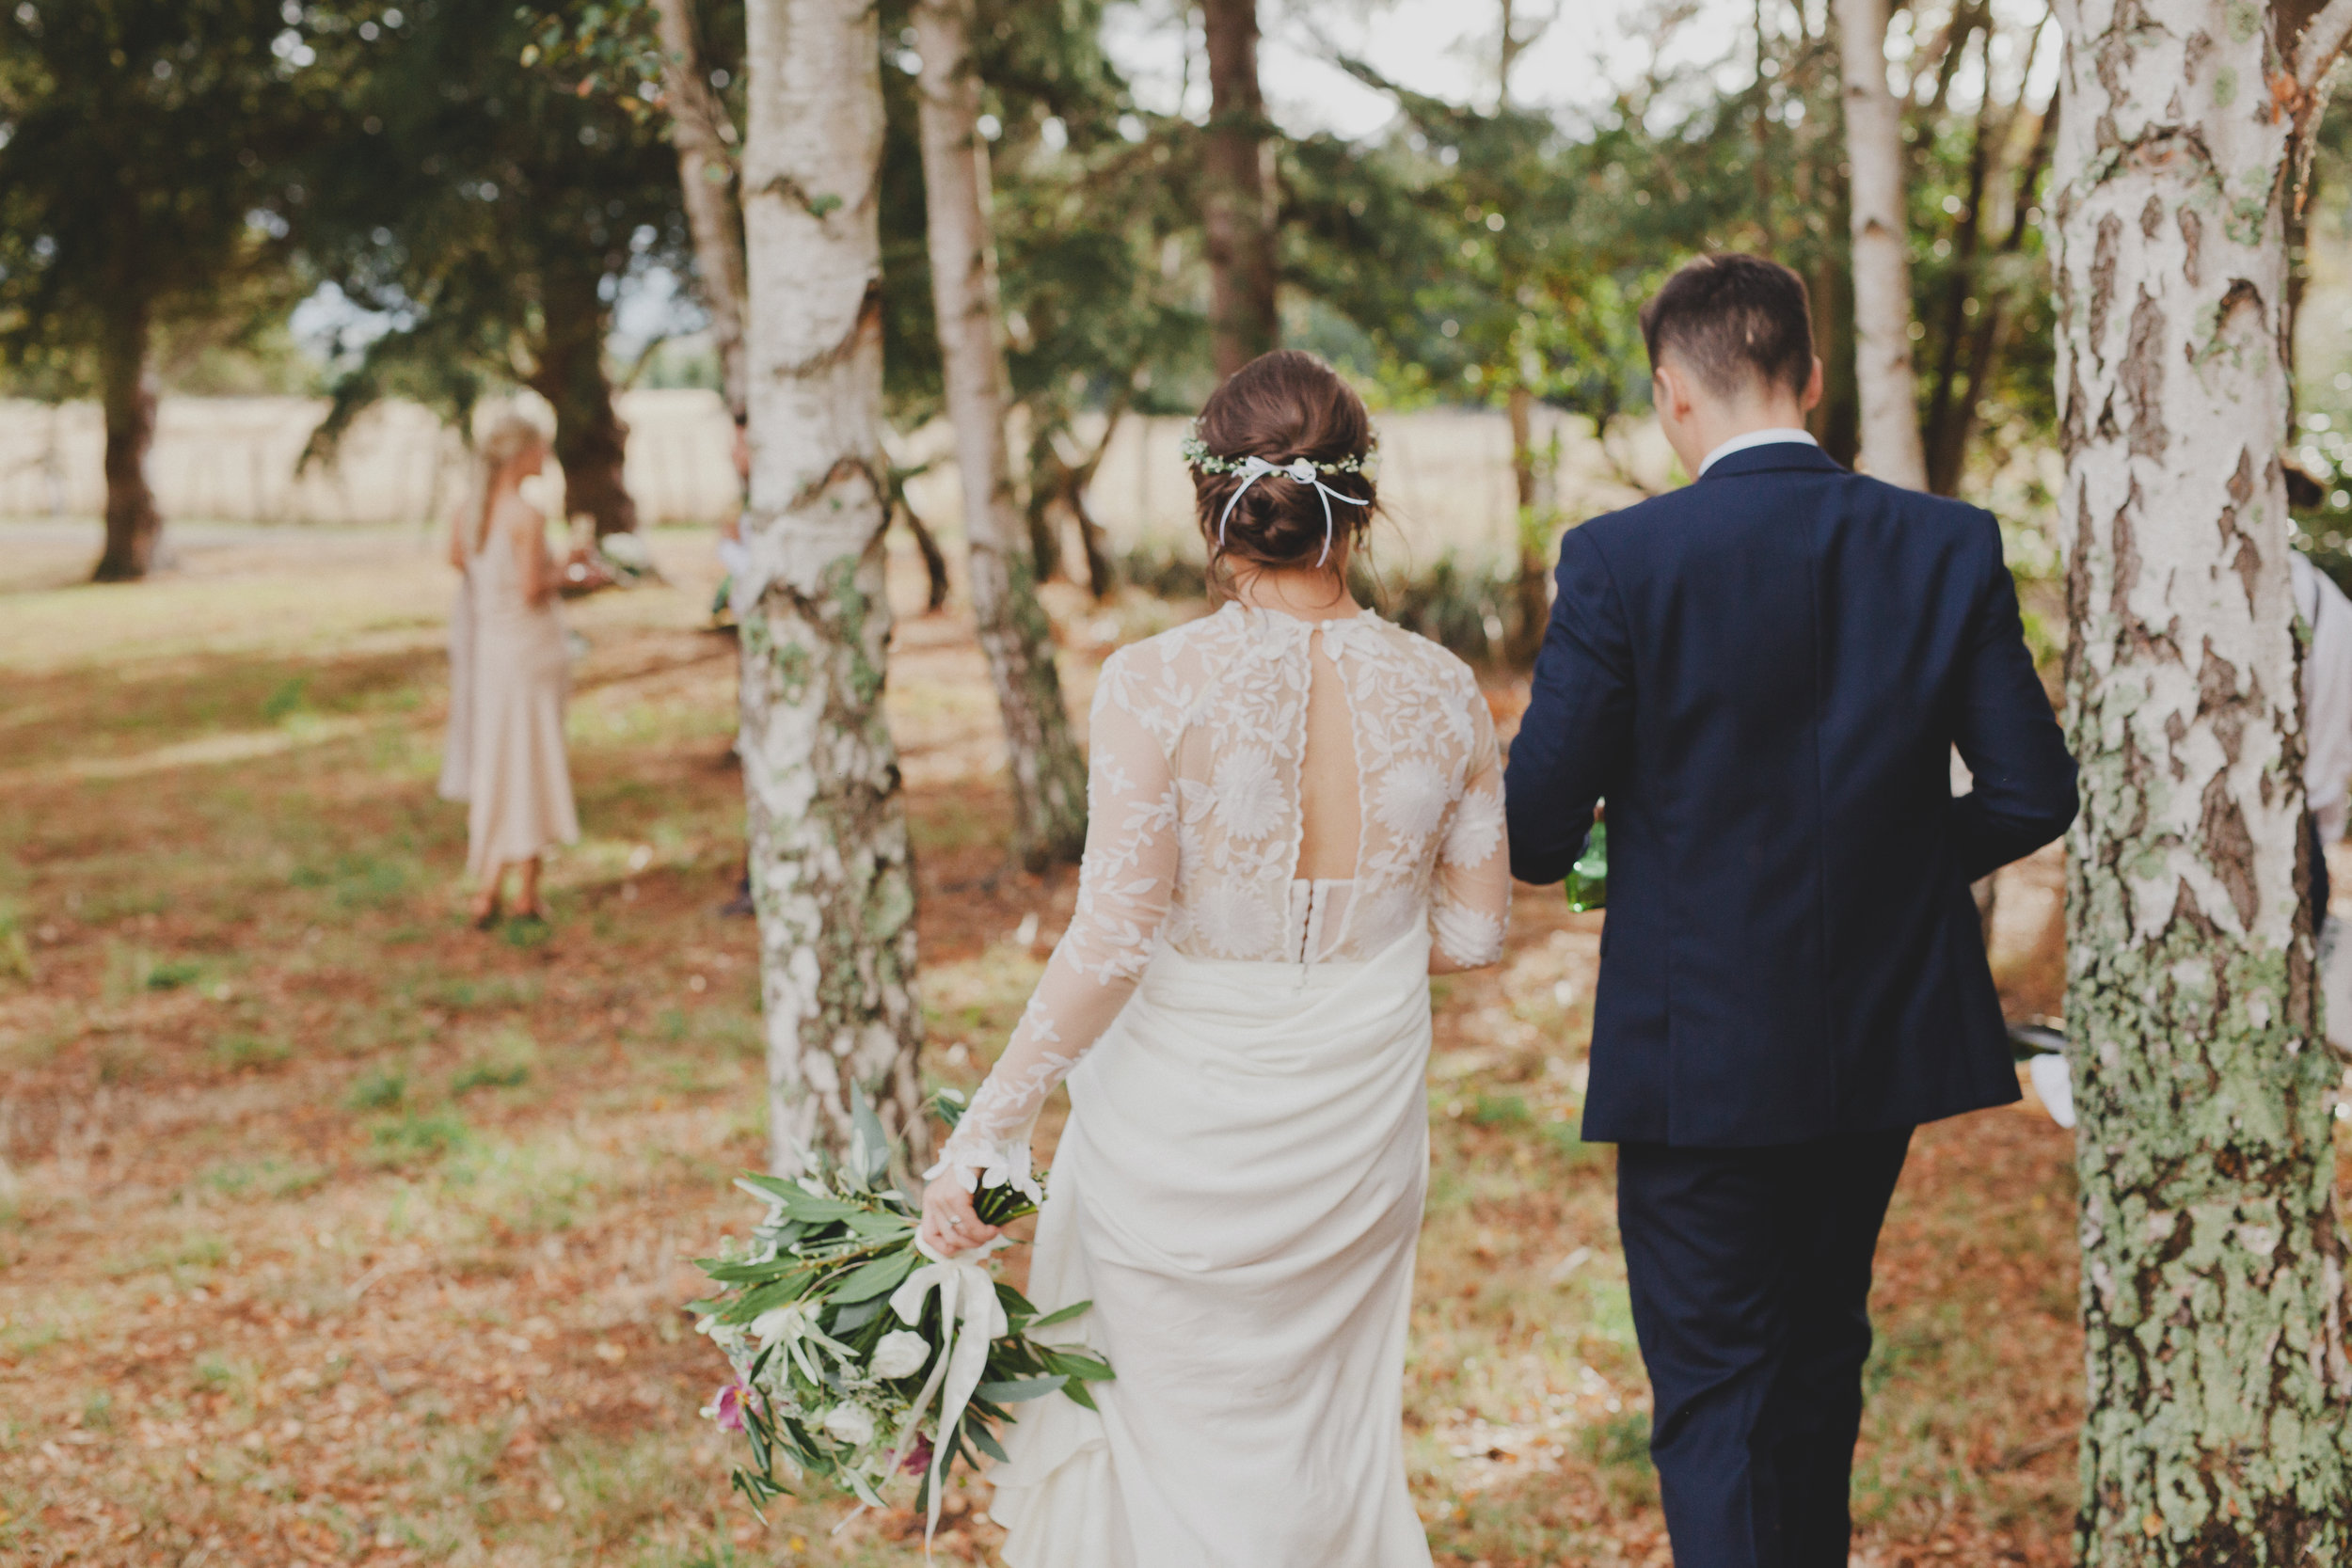 wellington wedding photography NZ - 1105.JPG